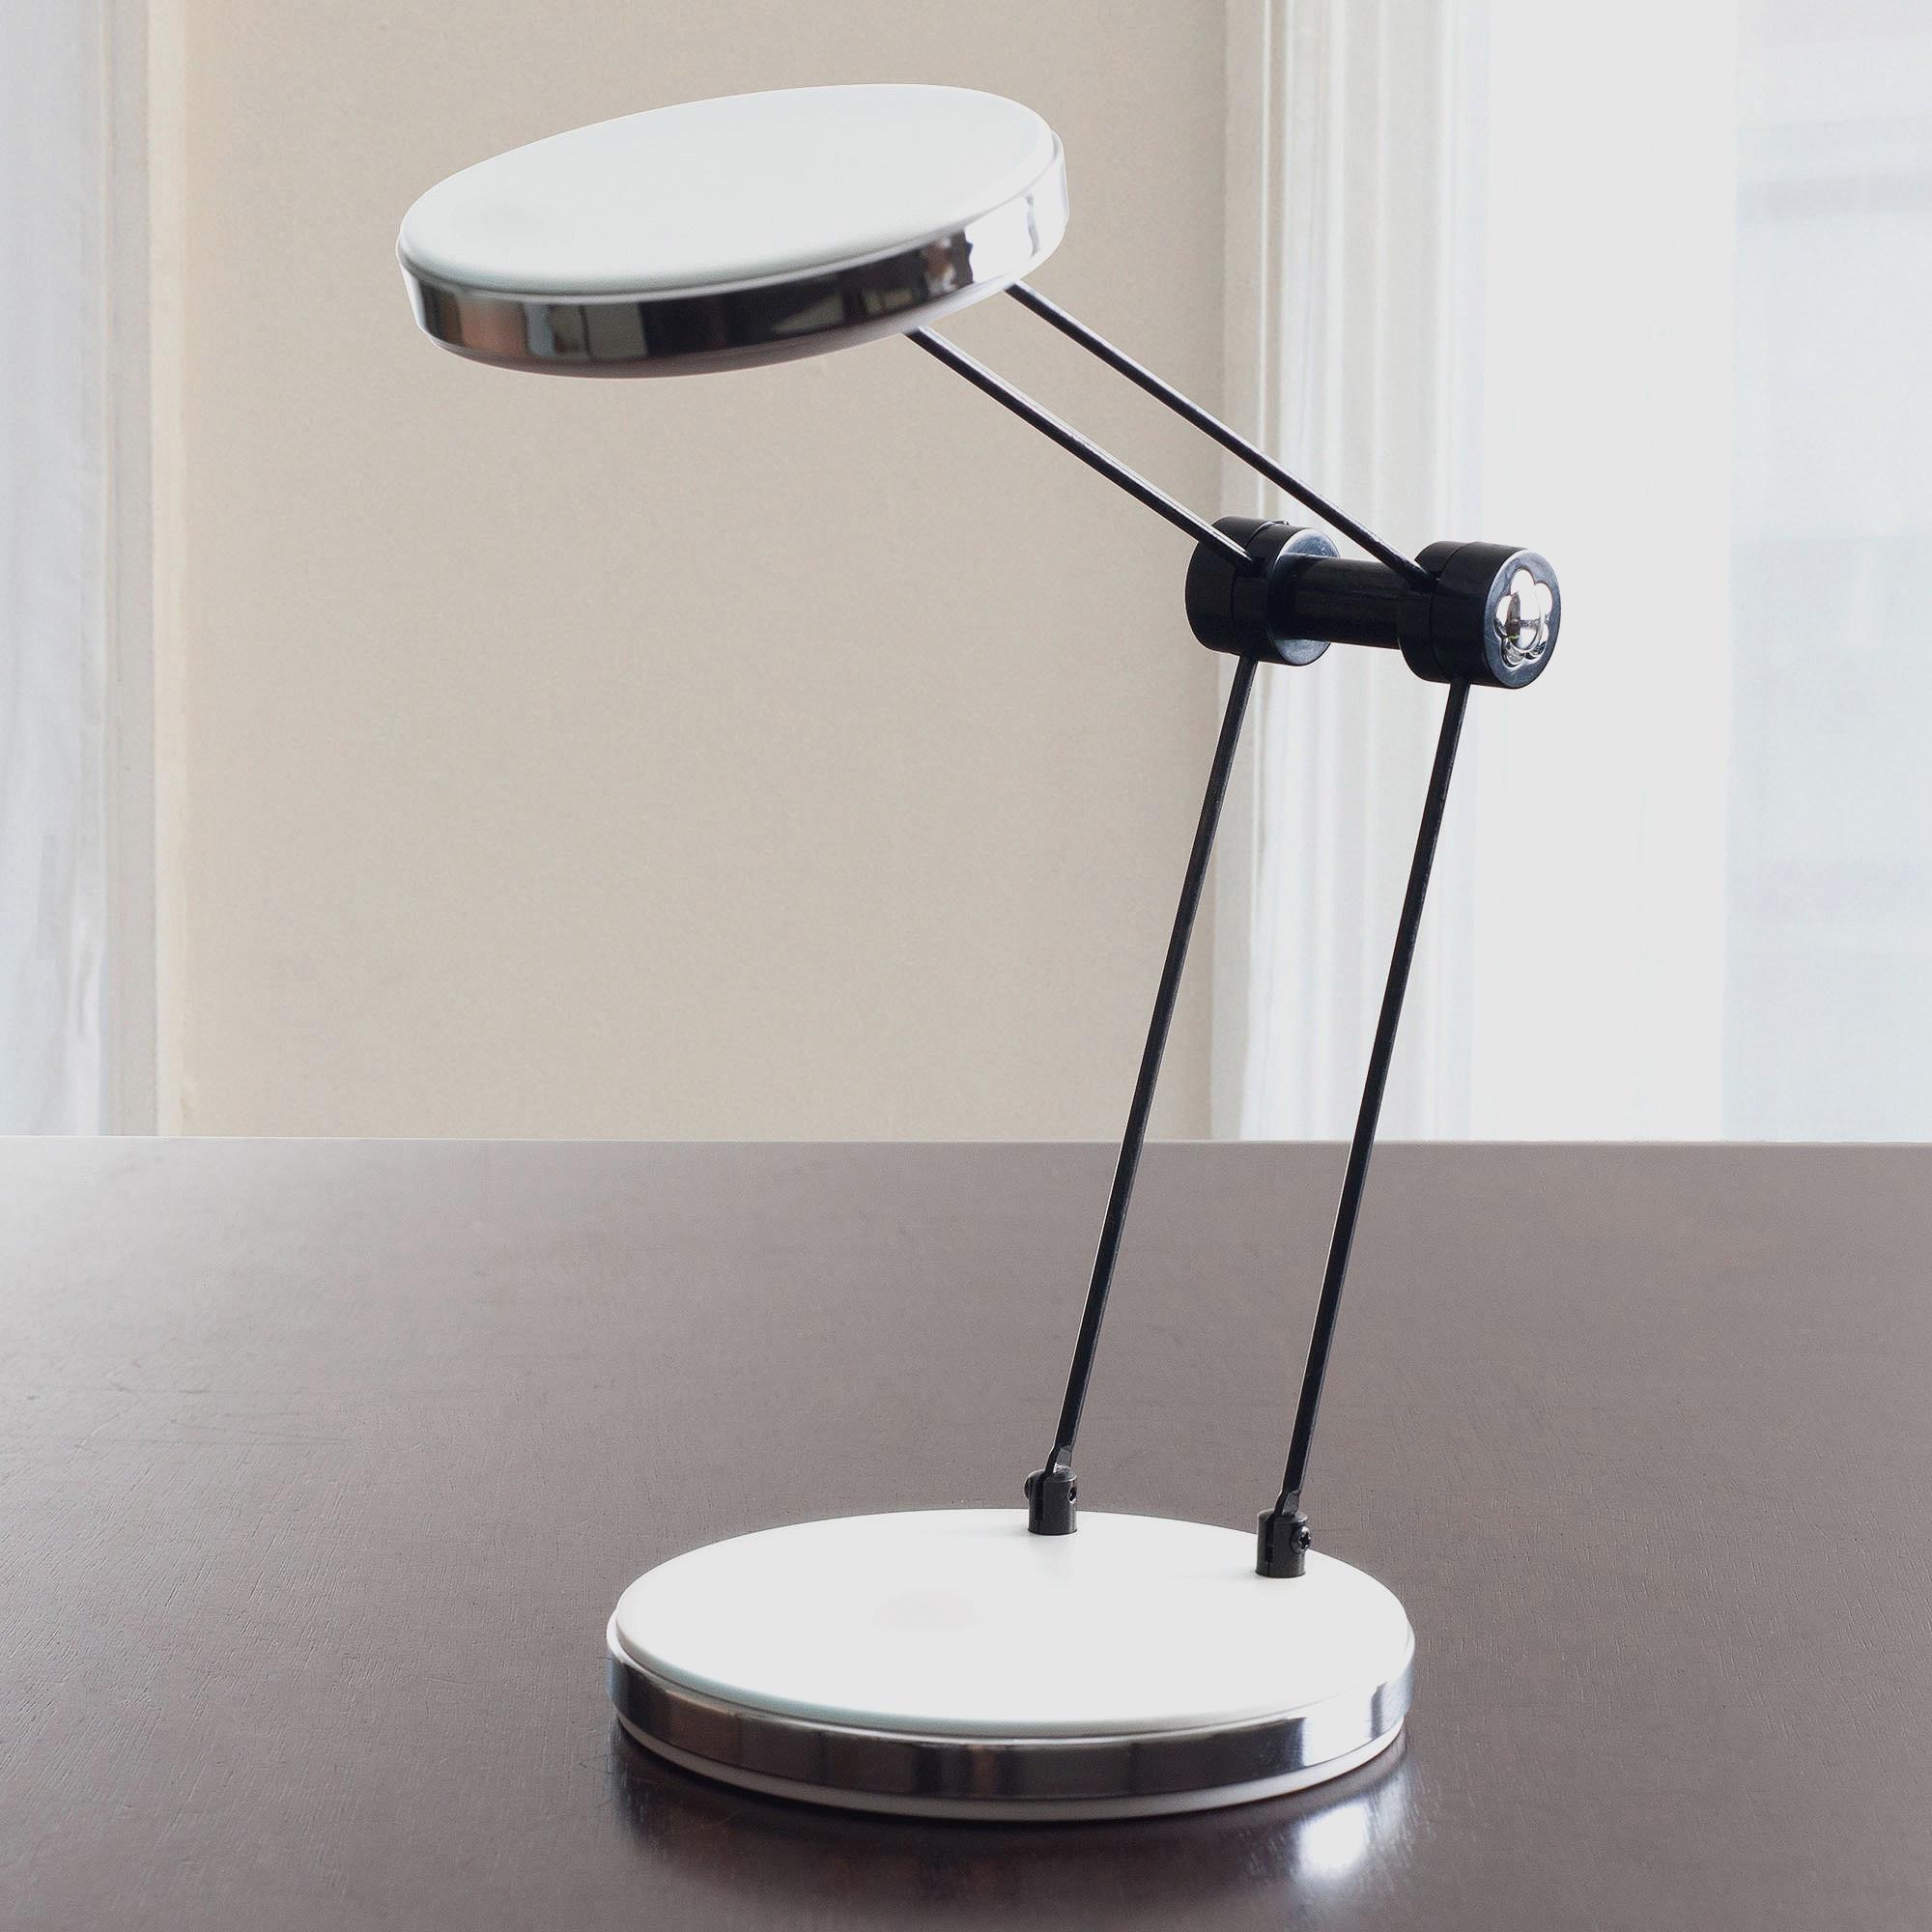 Best ideas about Walmart Desk Lamp . Save or Pin Led Desk Lamp Neu Lavish Home Led Usb Foldable Desk Lamp Now.